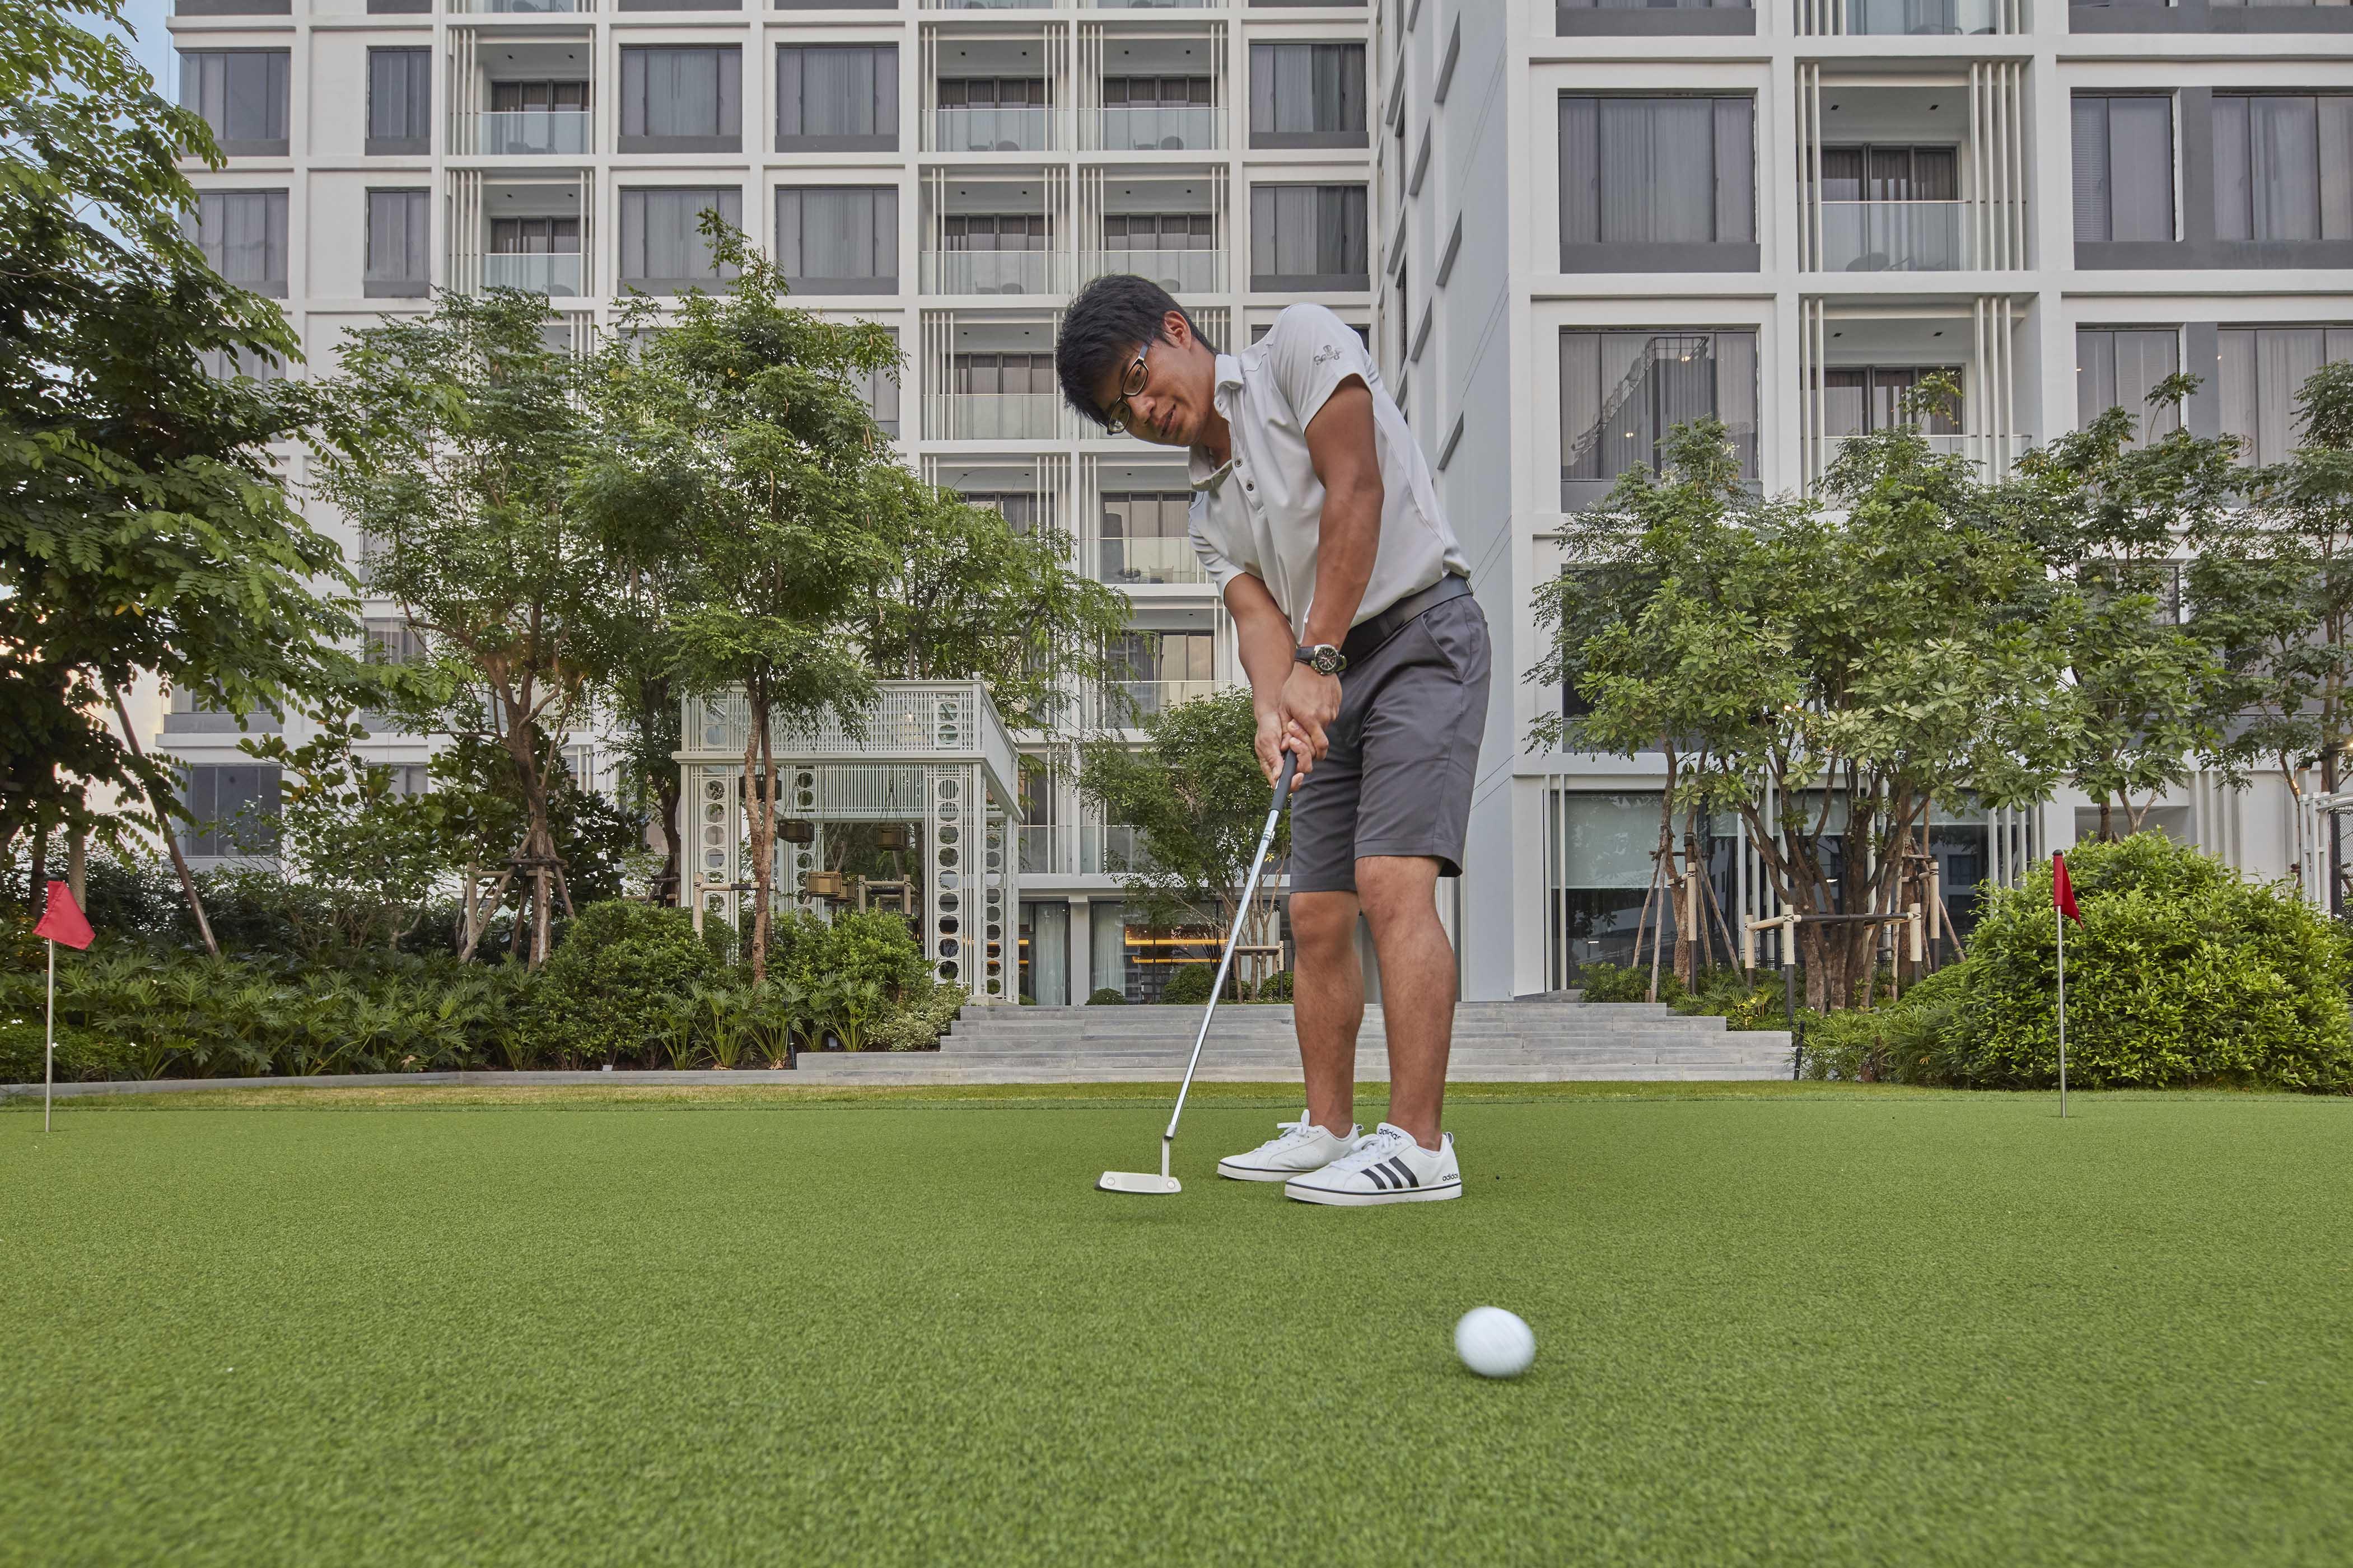 08 Golf Sally2